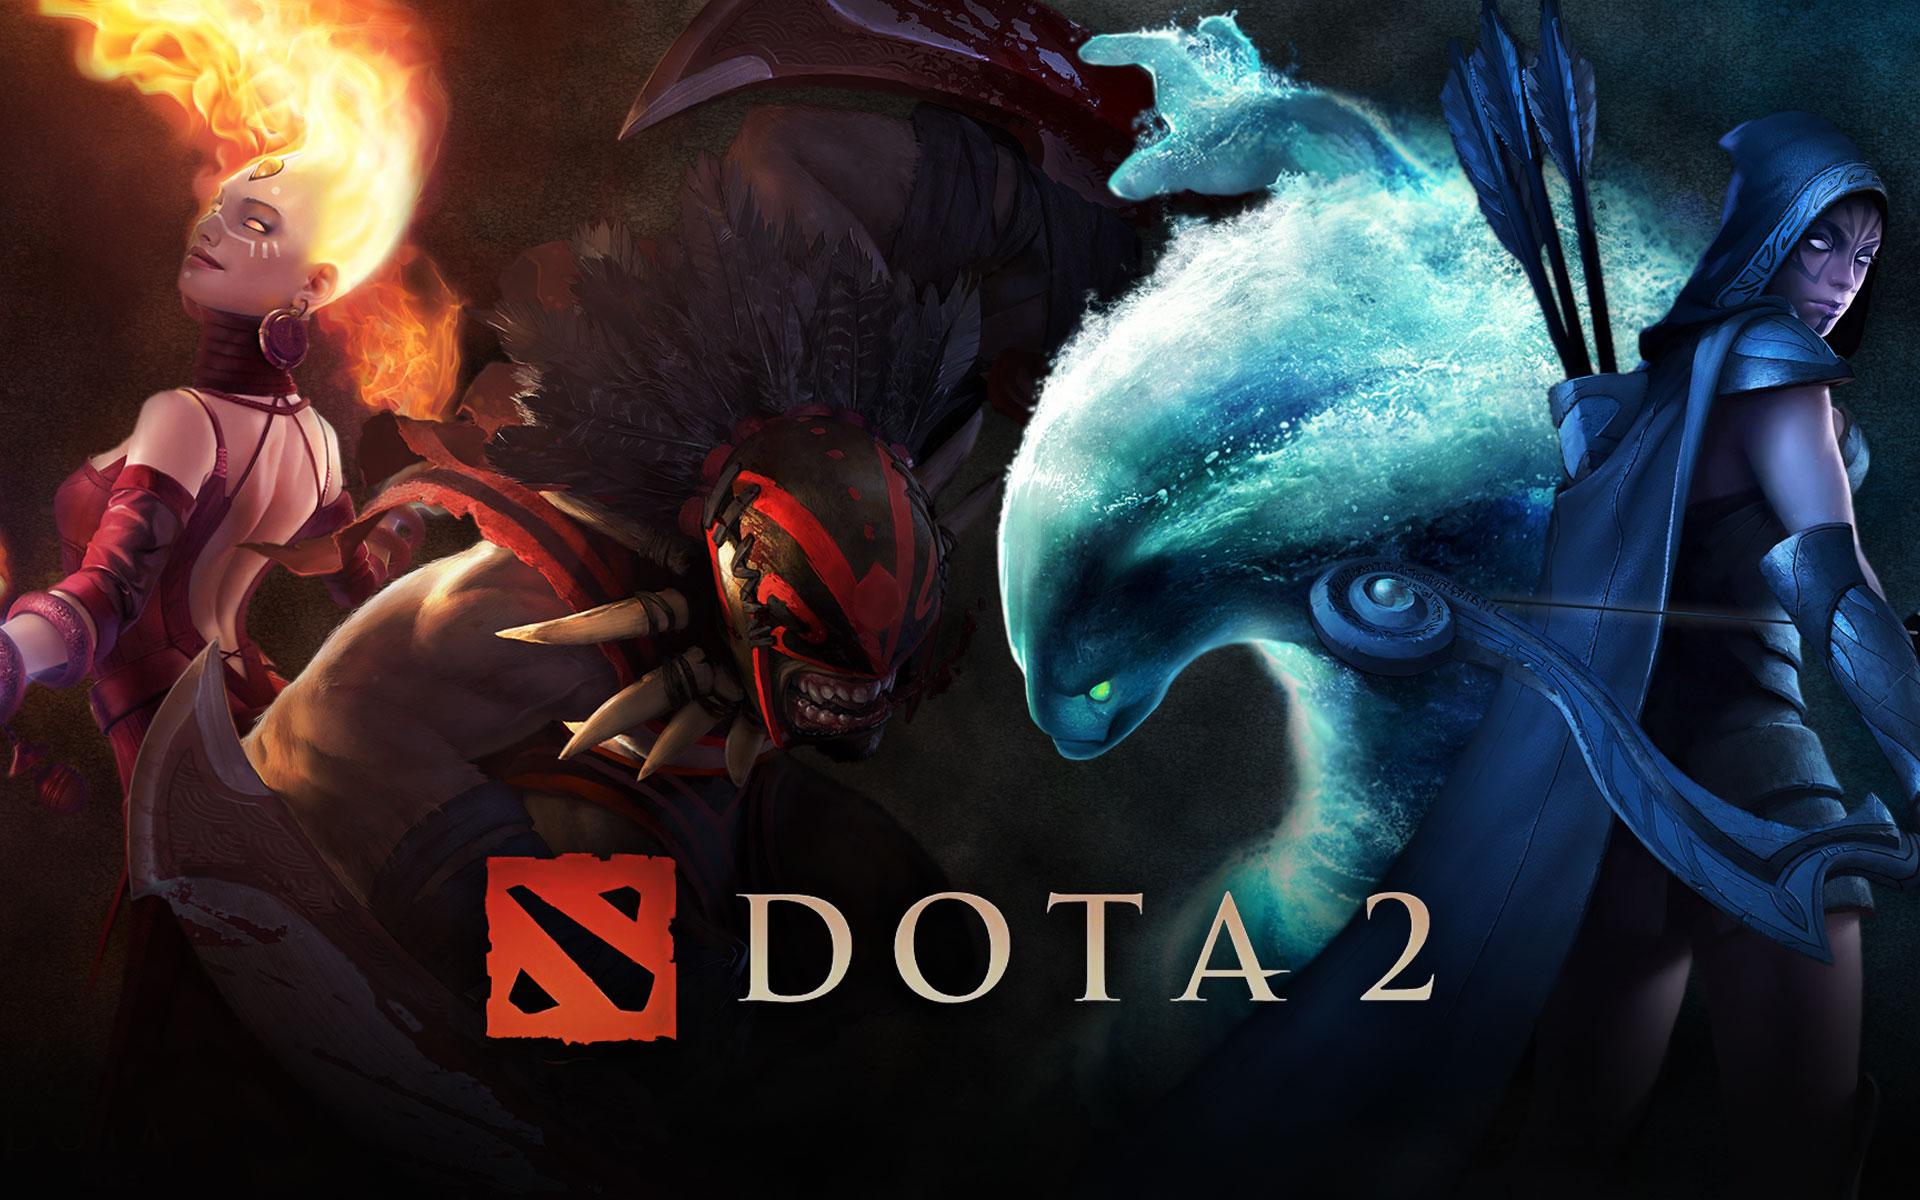 DOTA 2